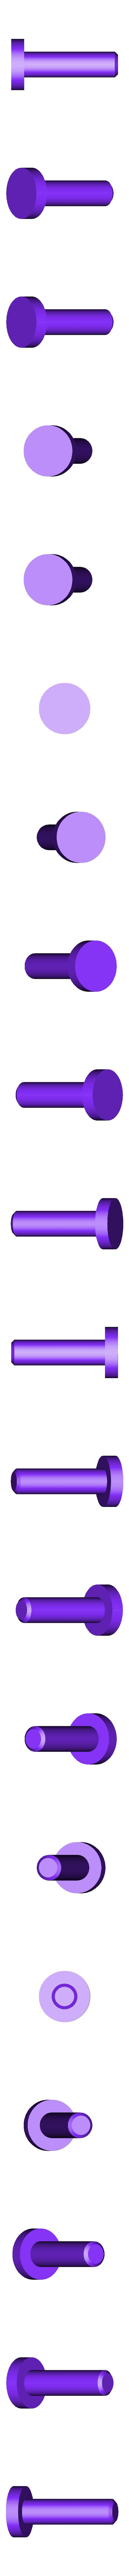 12 - NOSE WHEEL AXLE.stl Download STL file DOUGLAS F4D SKYRAY  • 3D printer object, 3DprintedArmy